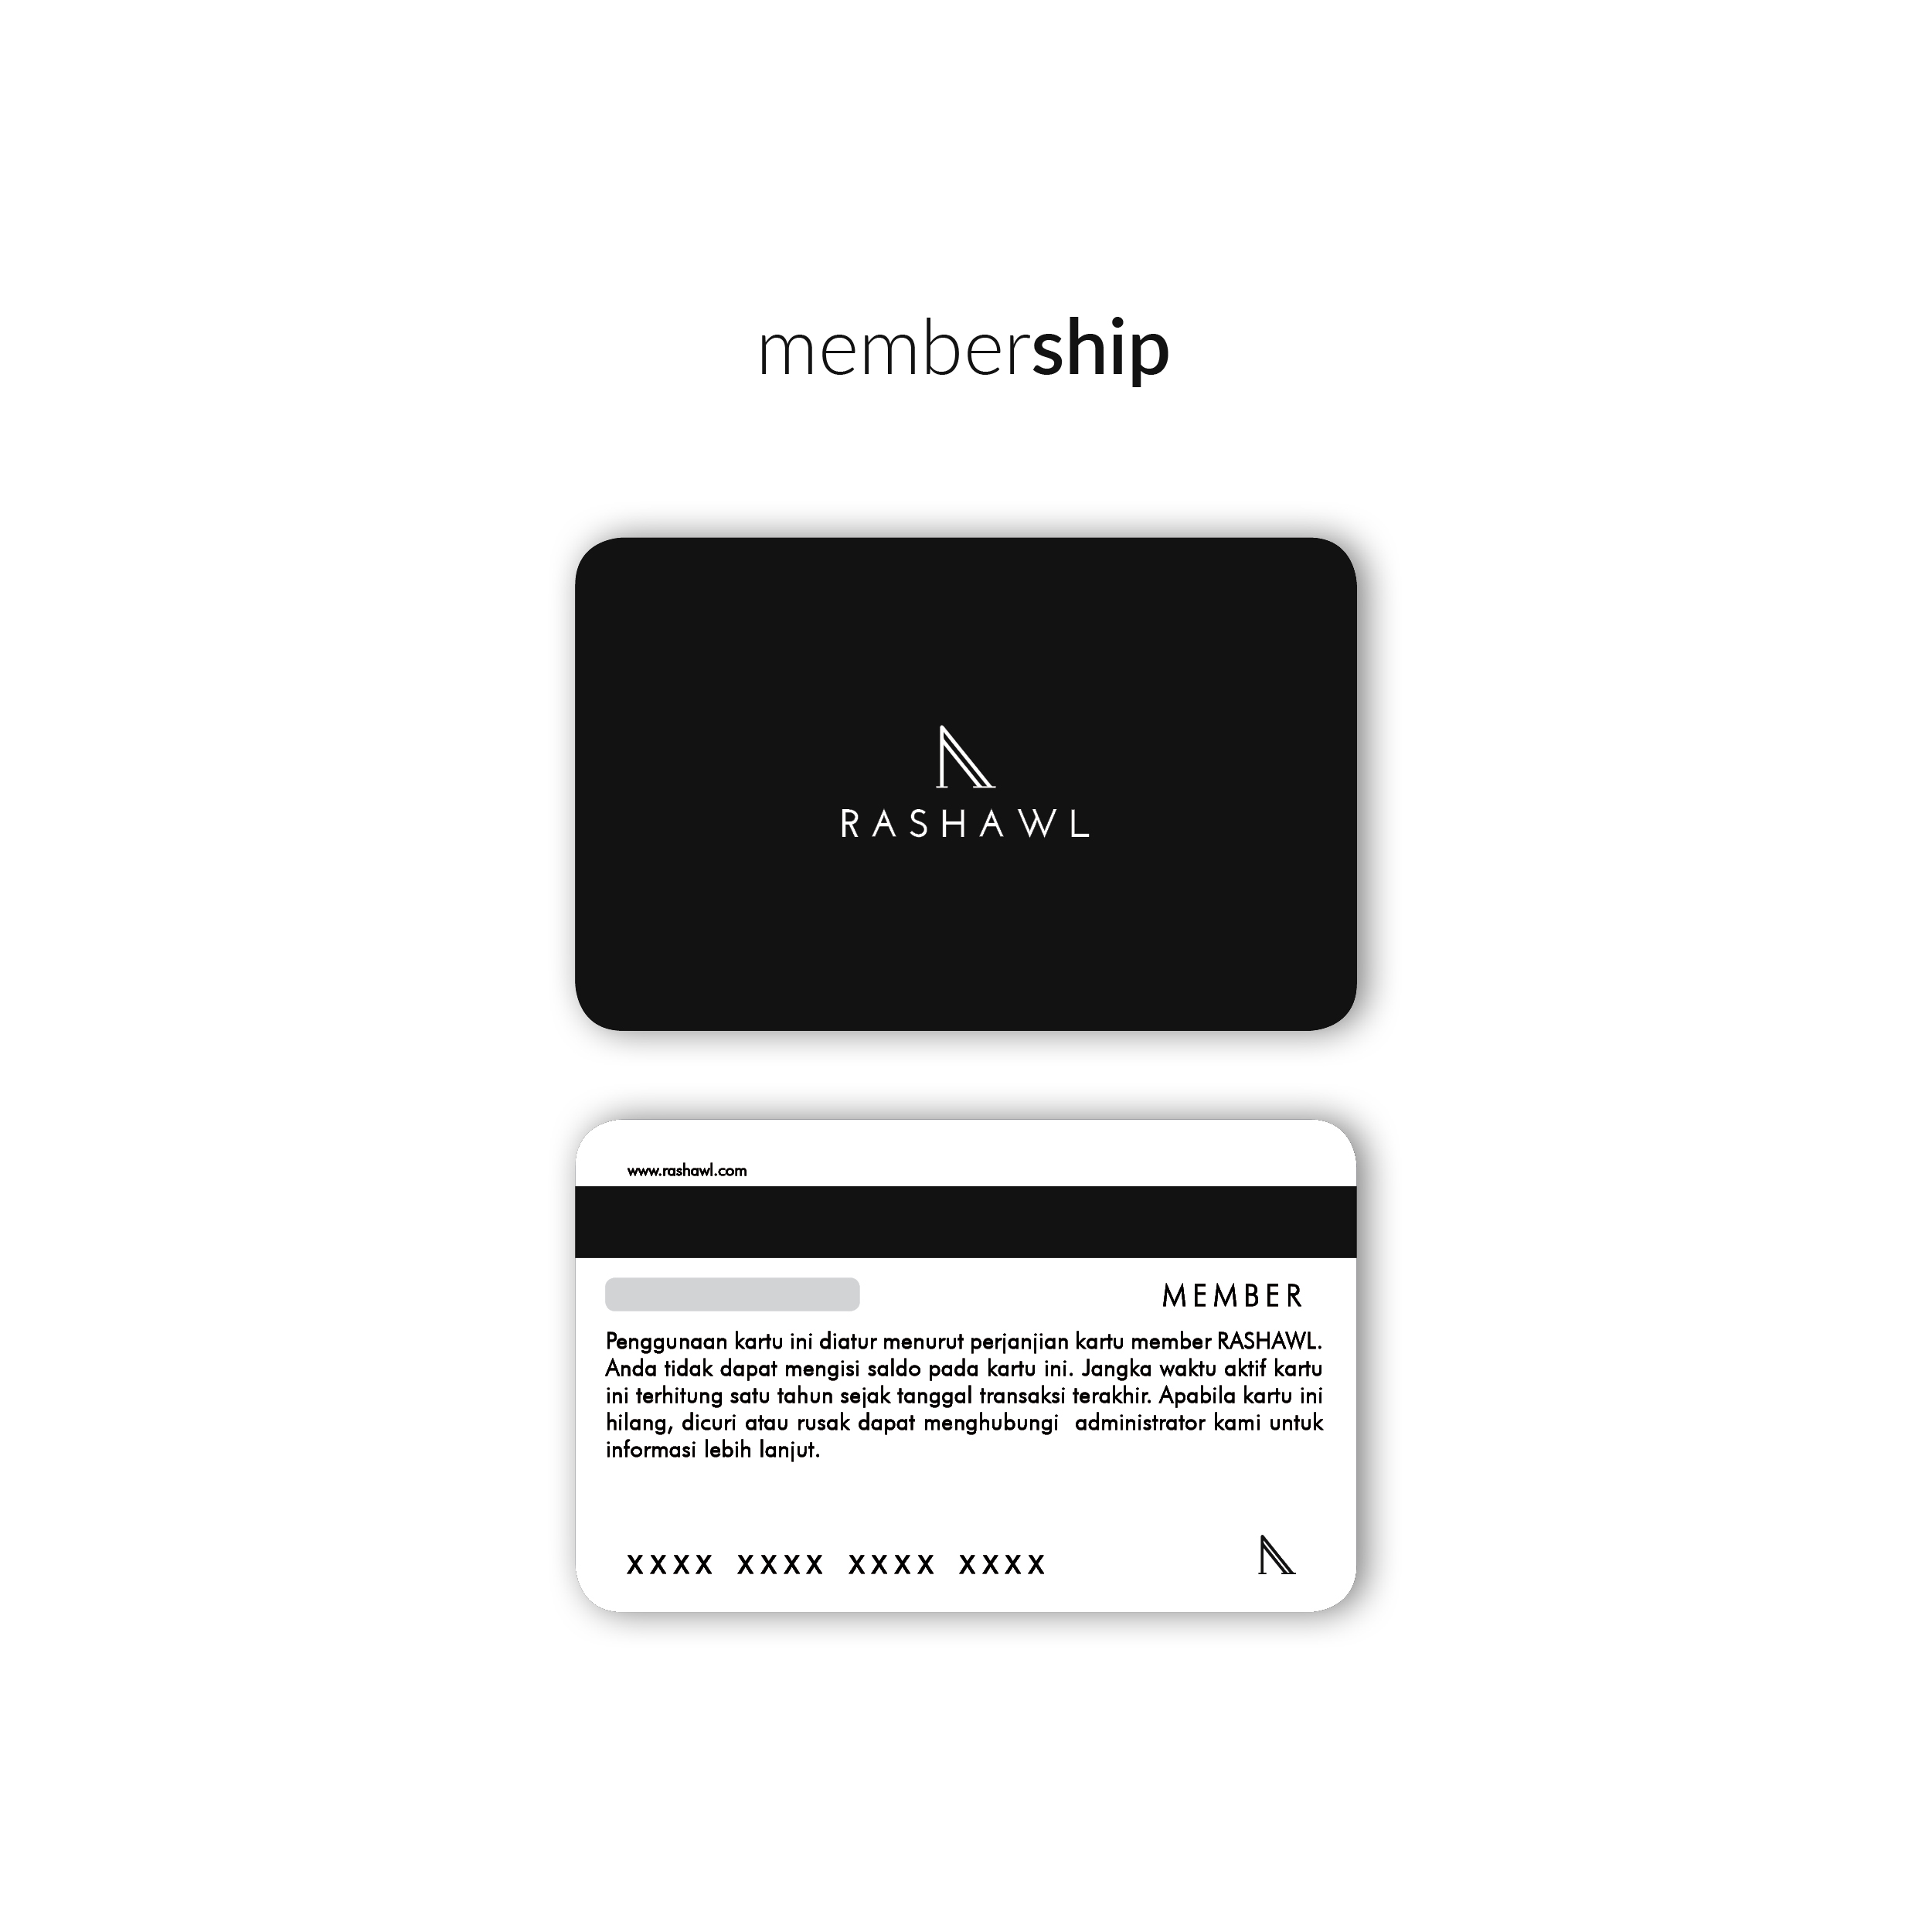 Rashawl Membership Program 2019 image